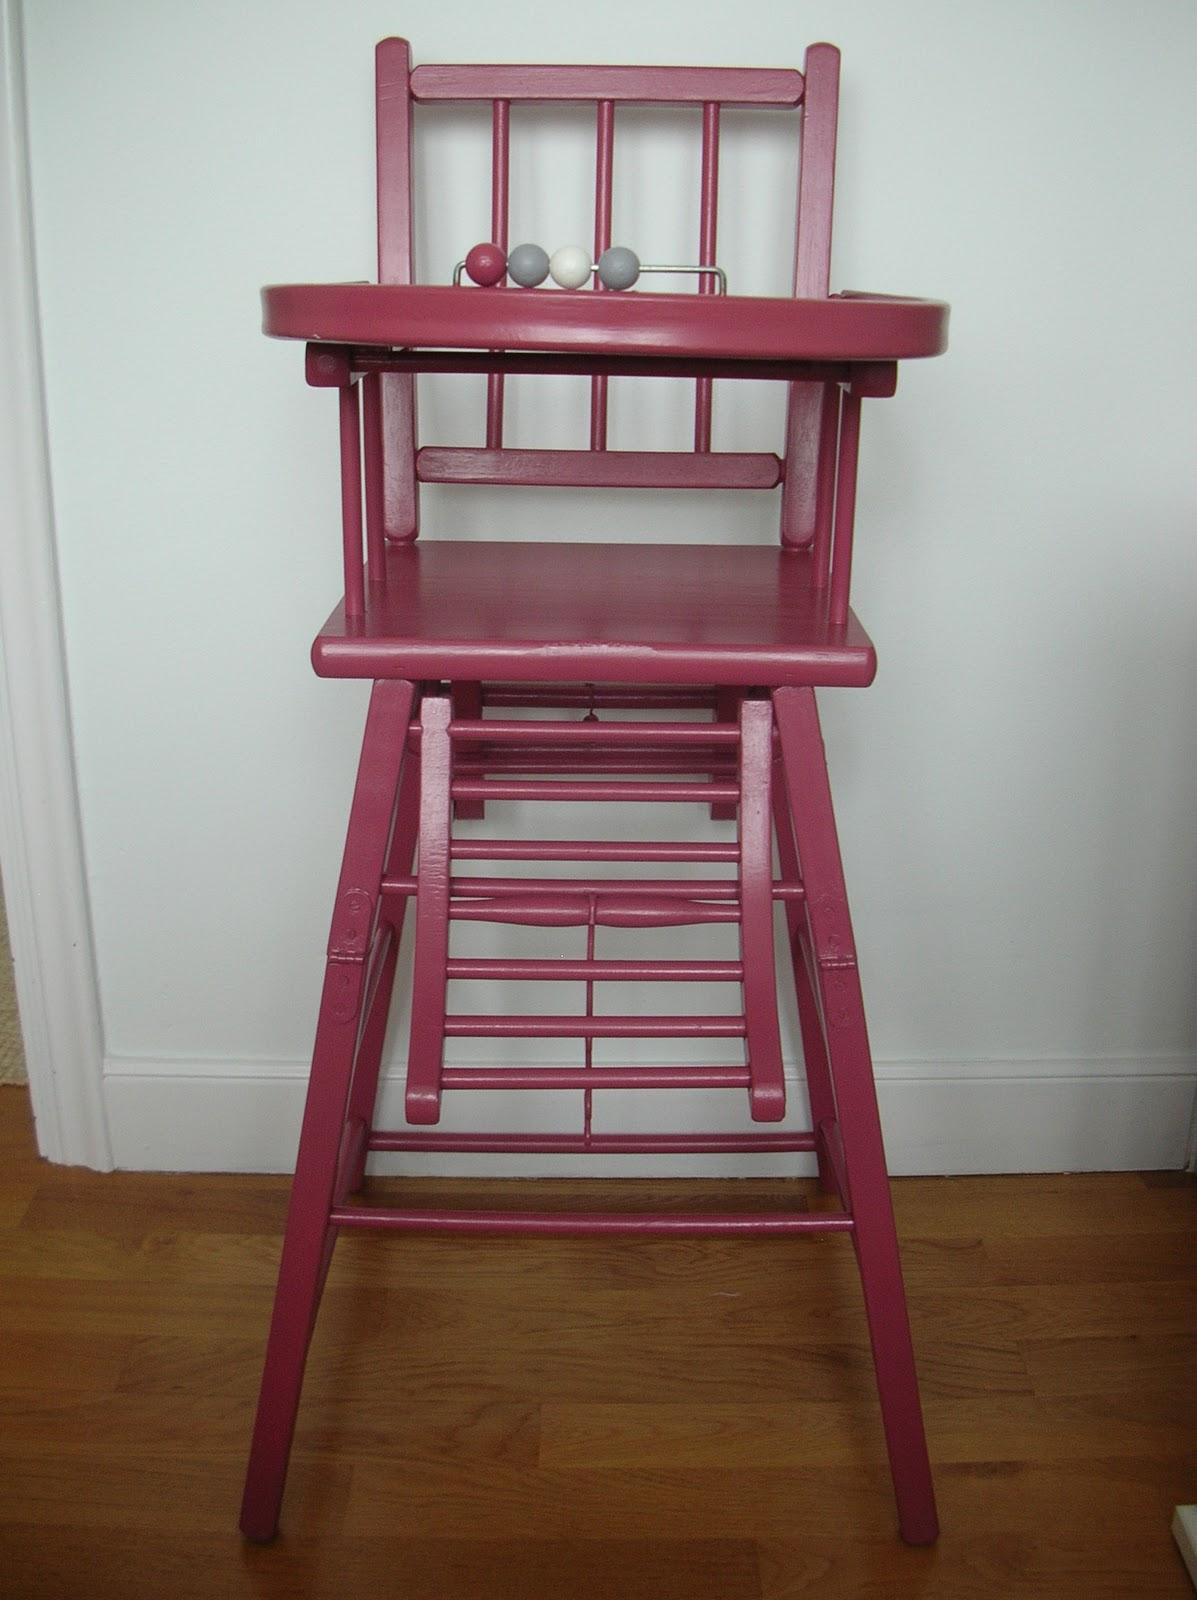 El taller de chlo trona personalizada - Trona de mesa ...